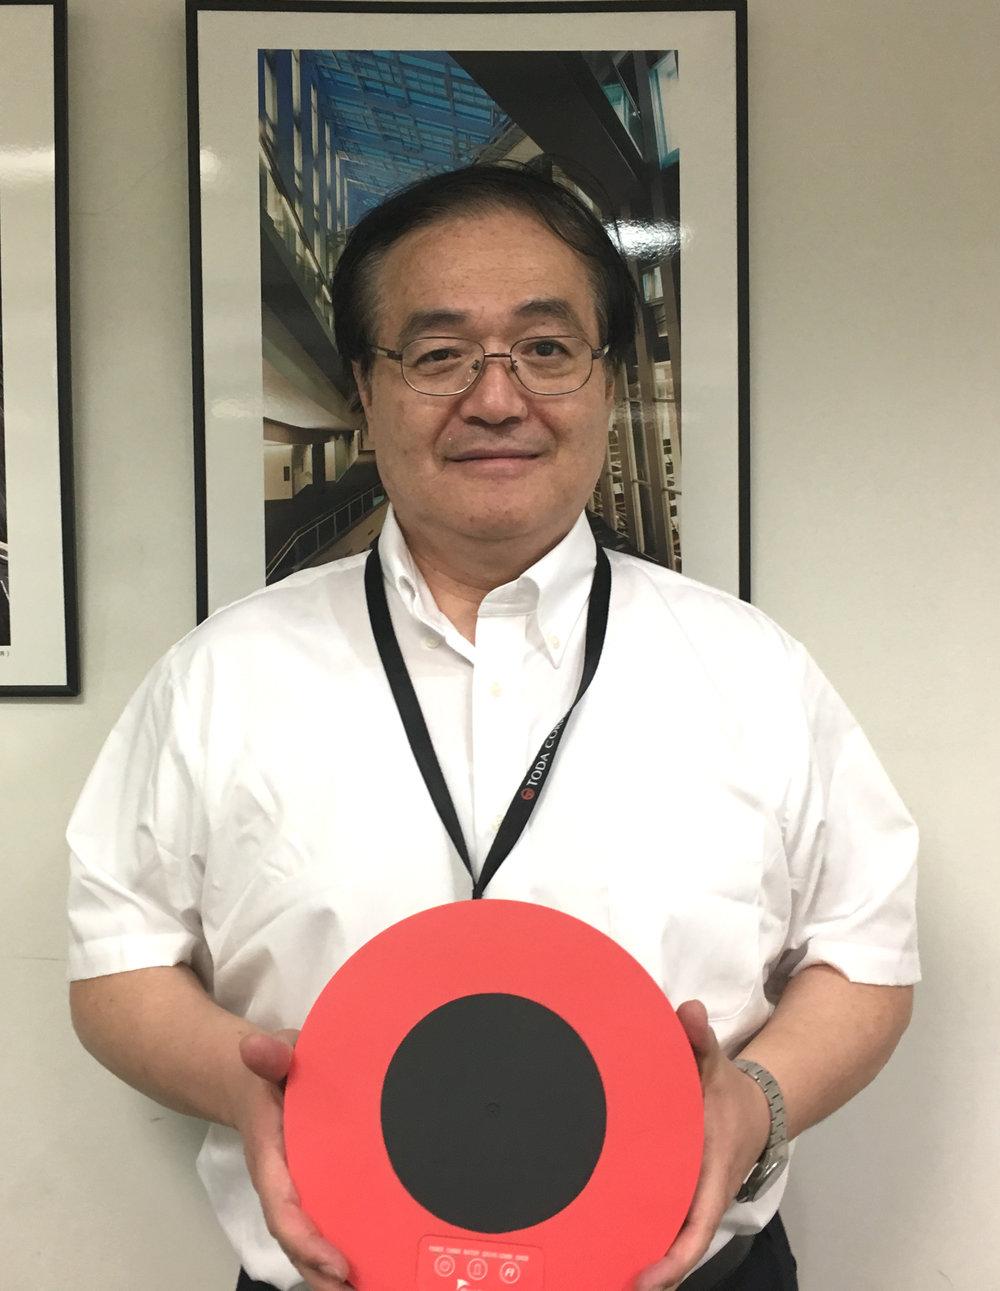 ICT推進課 担当課長 前田正敏様